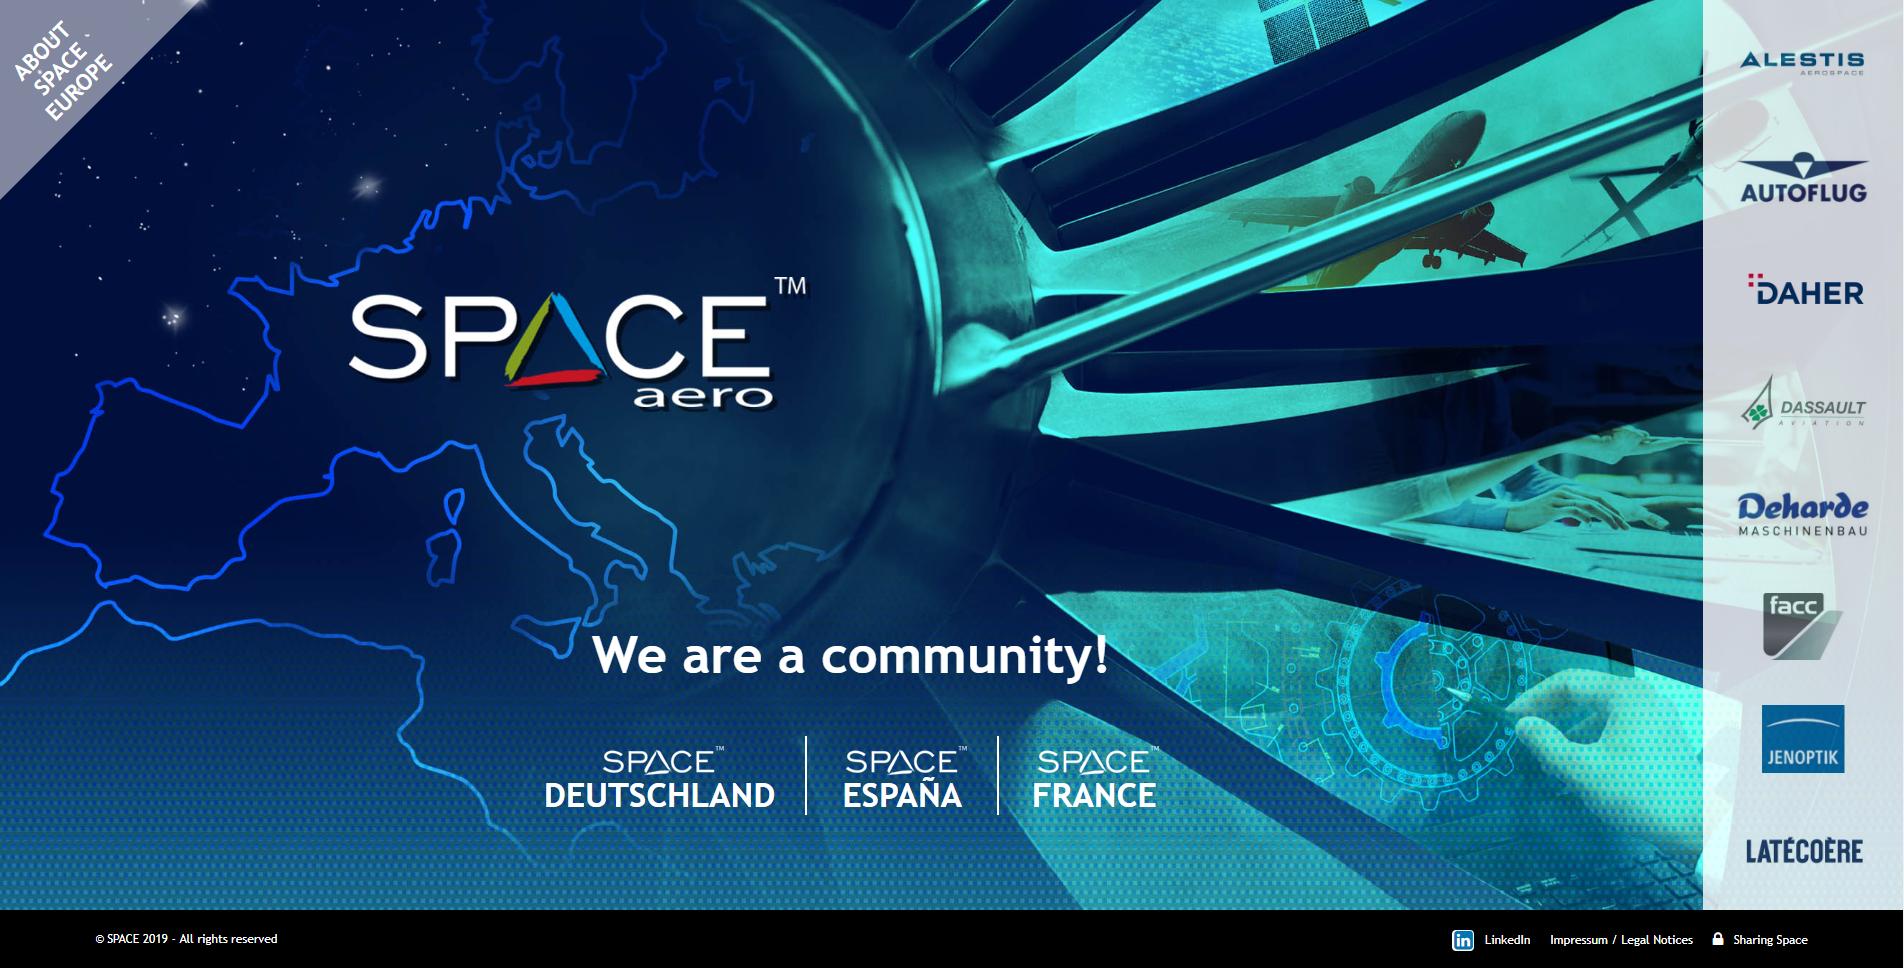 SPACE Aero